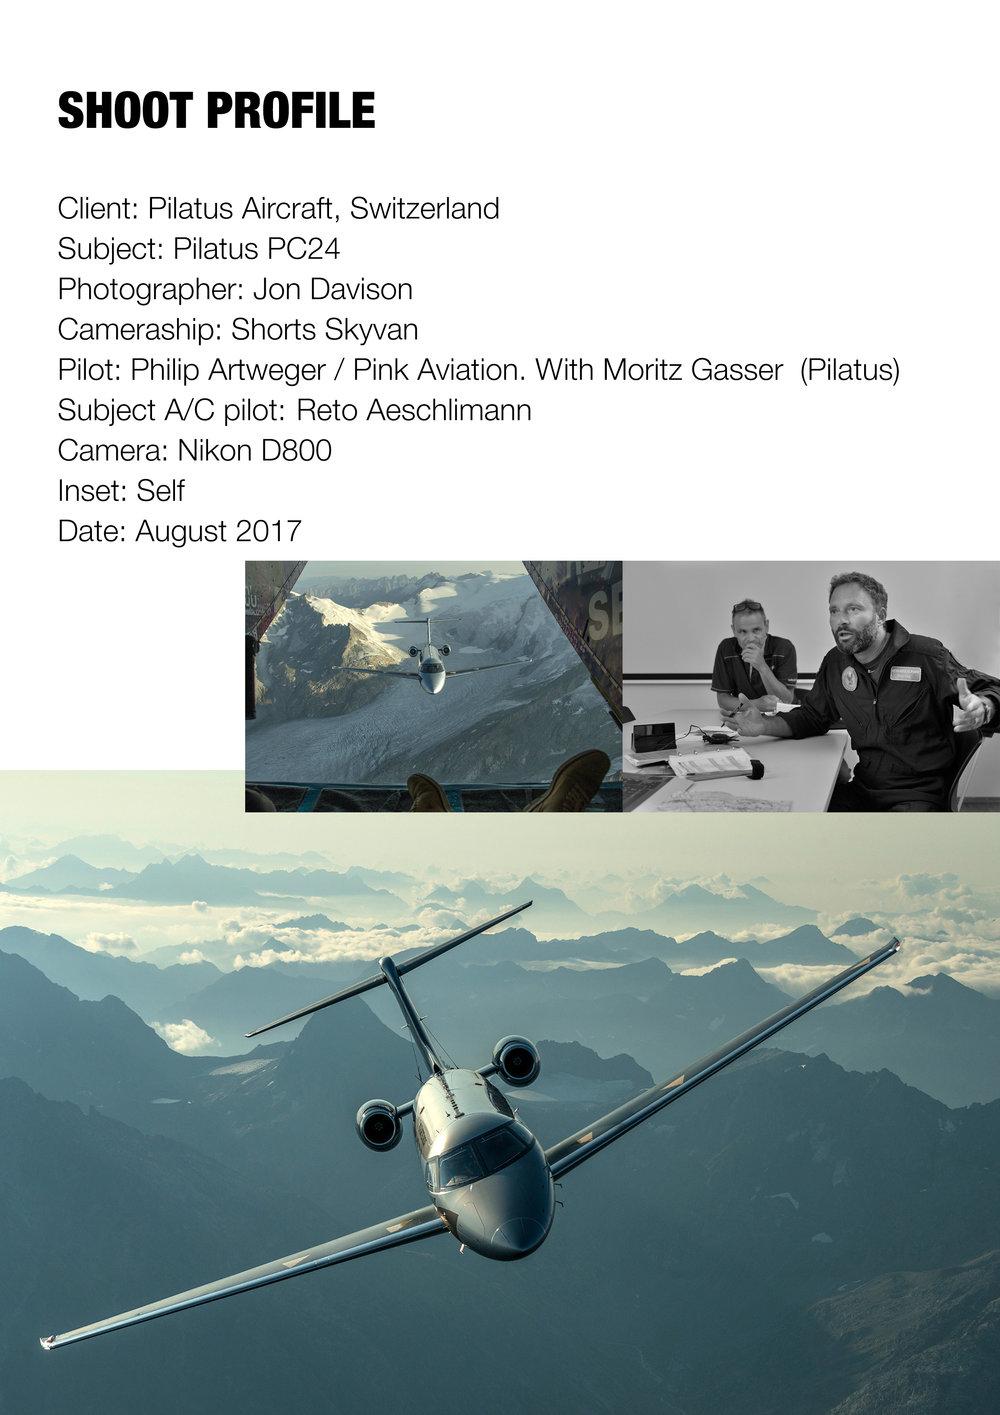 Pilatus PC24, Switzerland